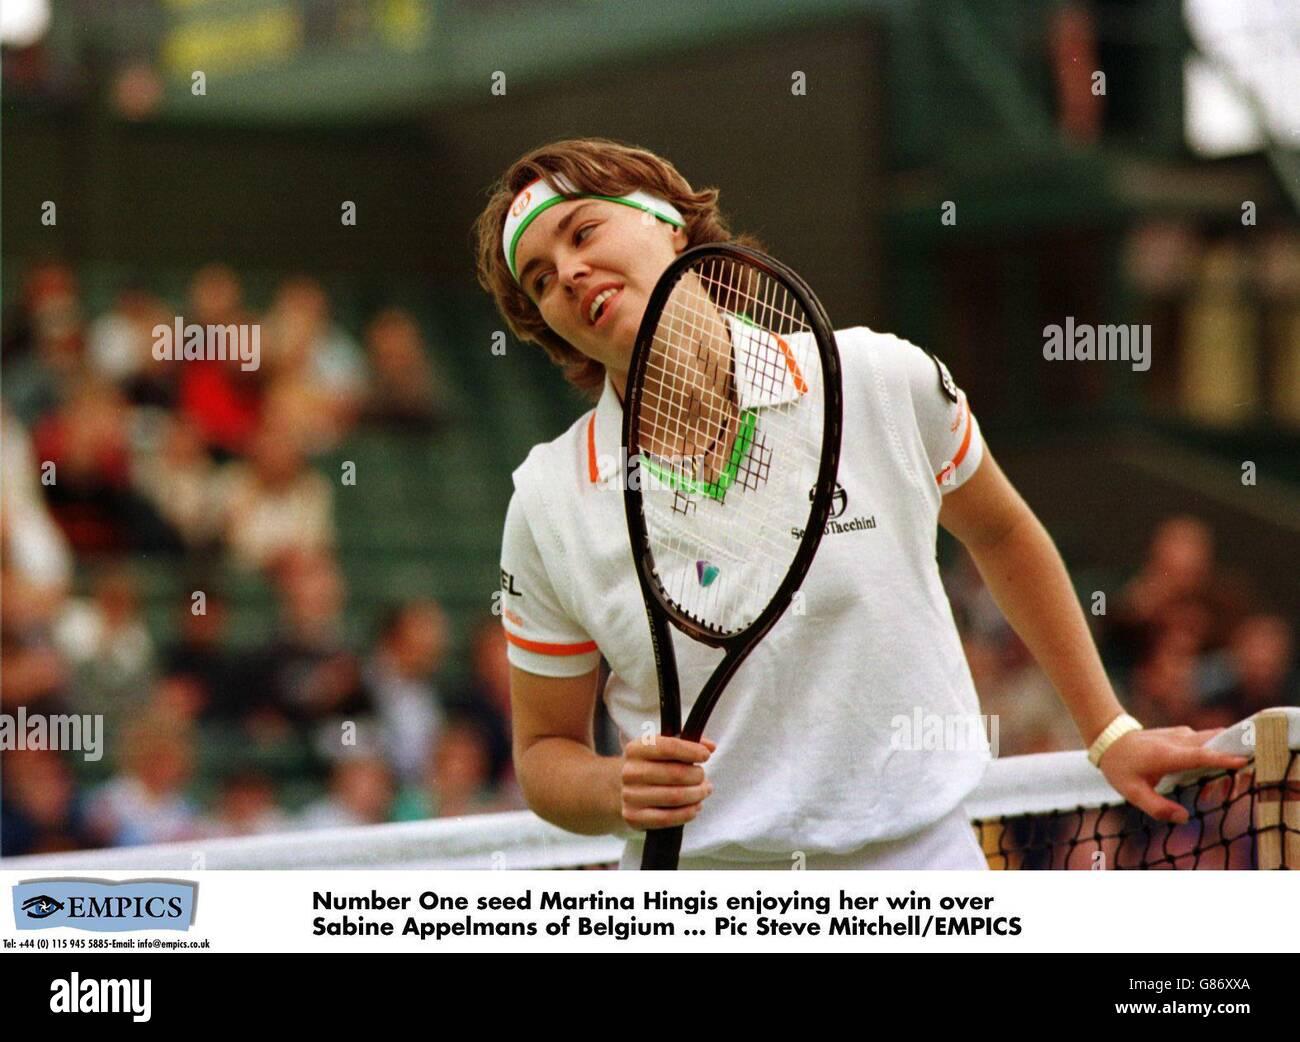 Tennis Wimbledon Championships Martina Hingis v Sabine